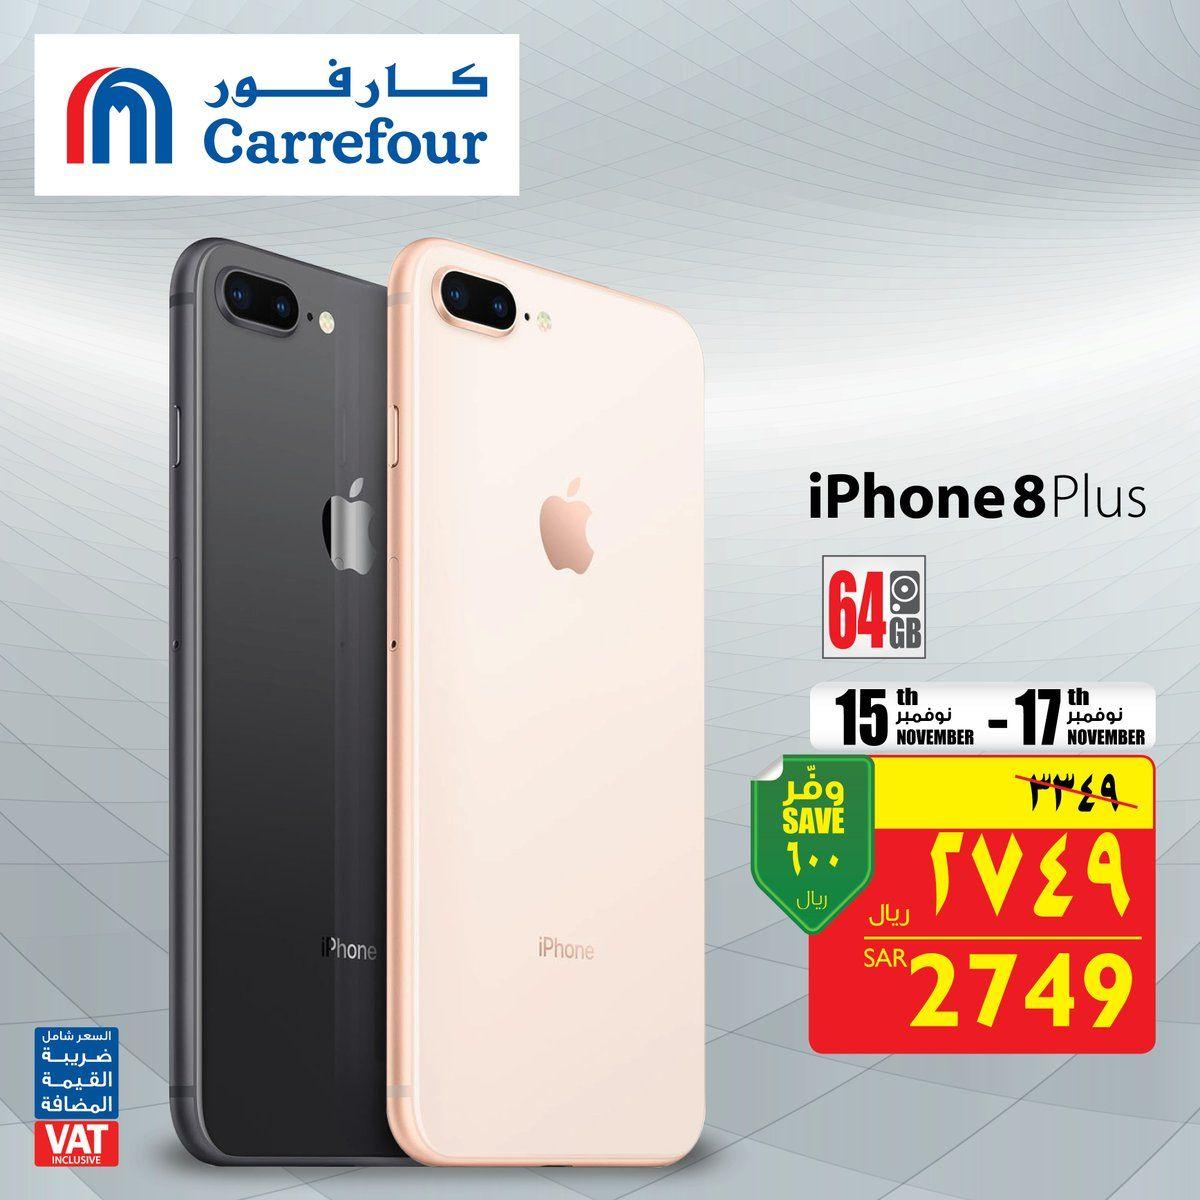 عرض كارفور السعودية علي جوالات ايفون اكس وايفون 8 بلس حتي 17 11 2018 عرض يومين عروض اليوم Phone Carrefour Iphone